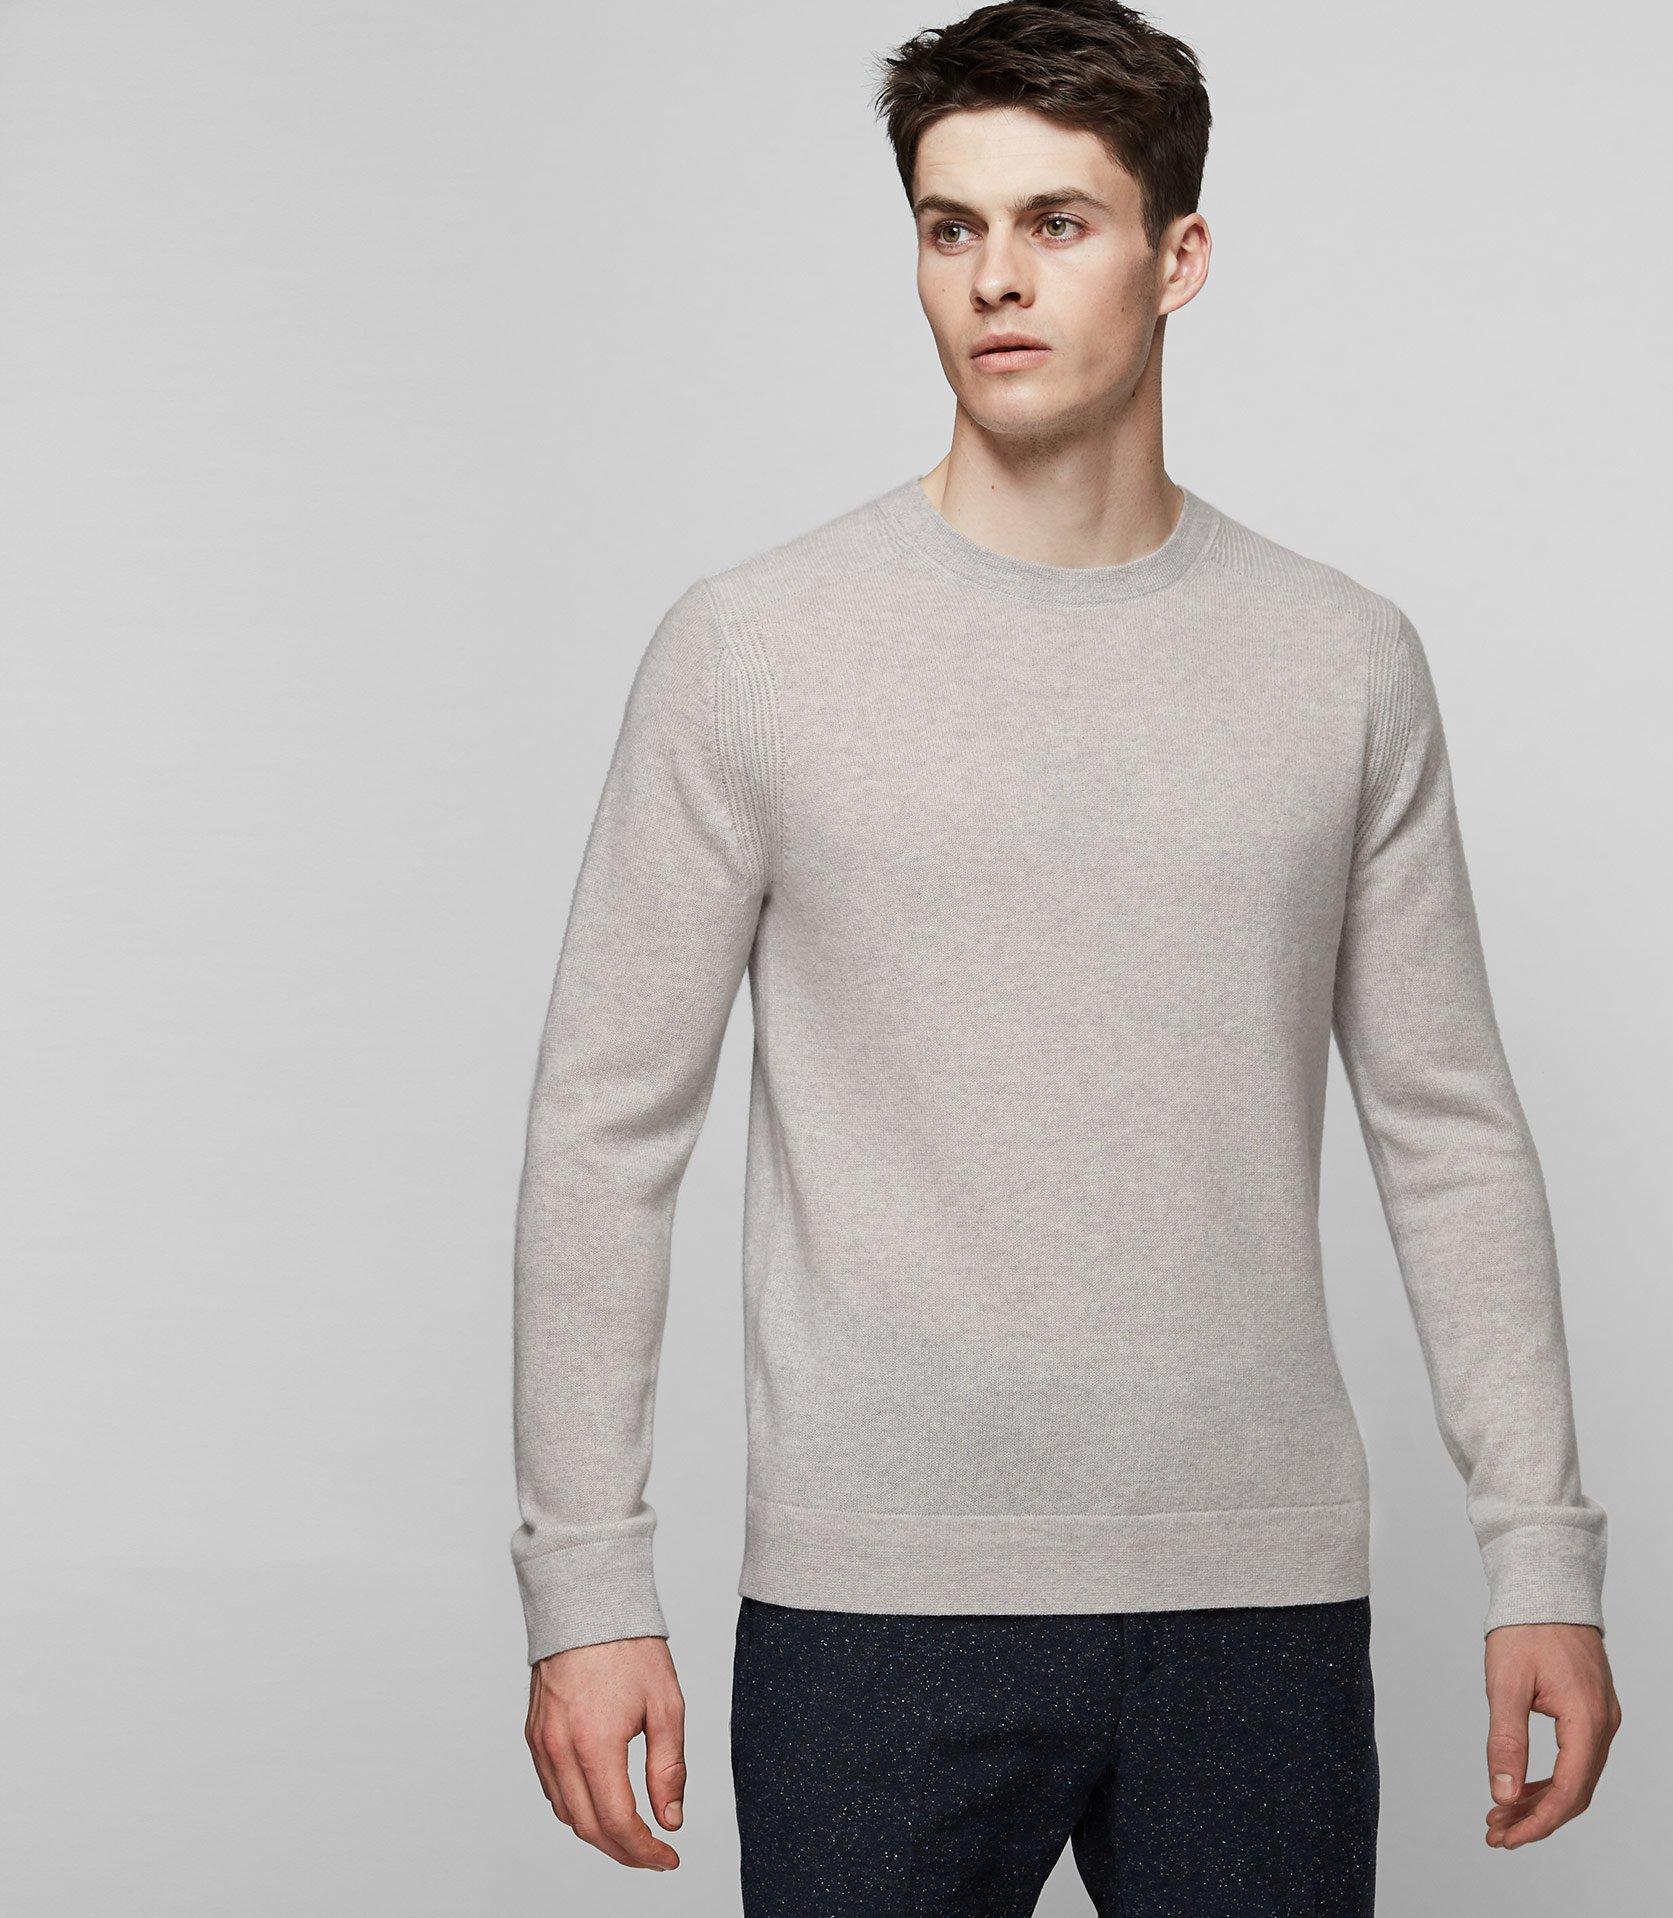 0723ea0f736 Reiss Hart Merino Wool Jumper in Gray for Men - Save 74% - Lyst